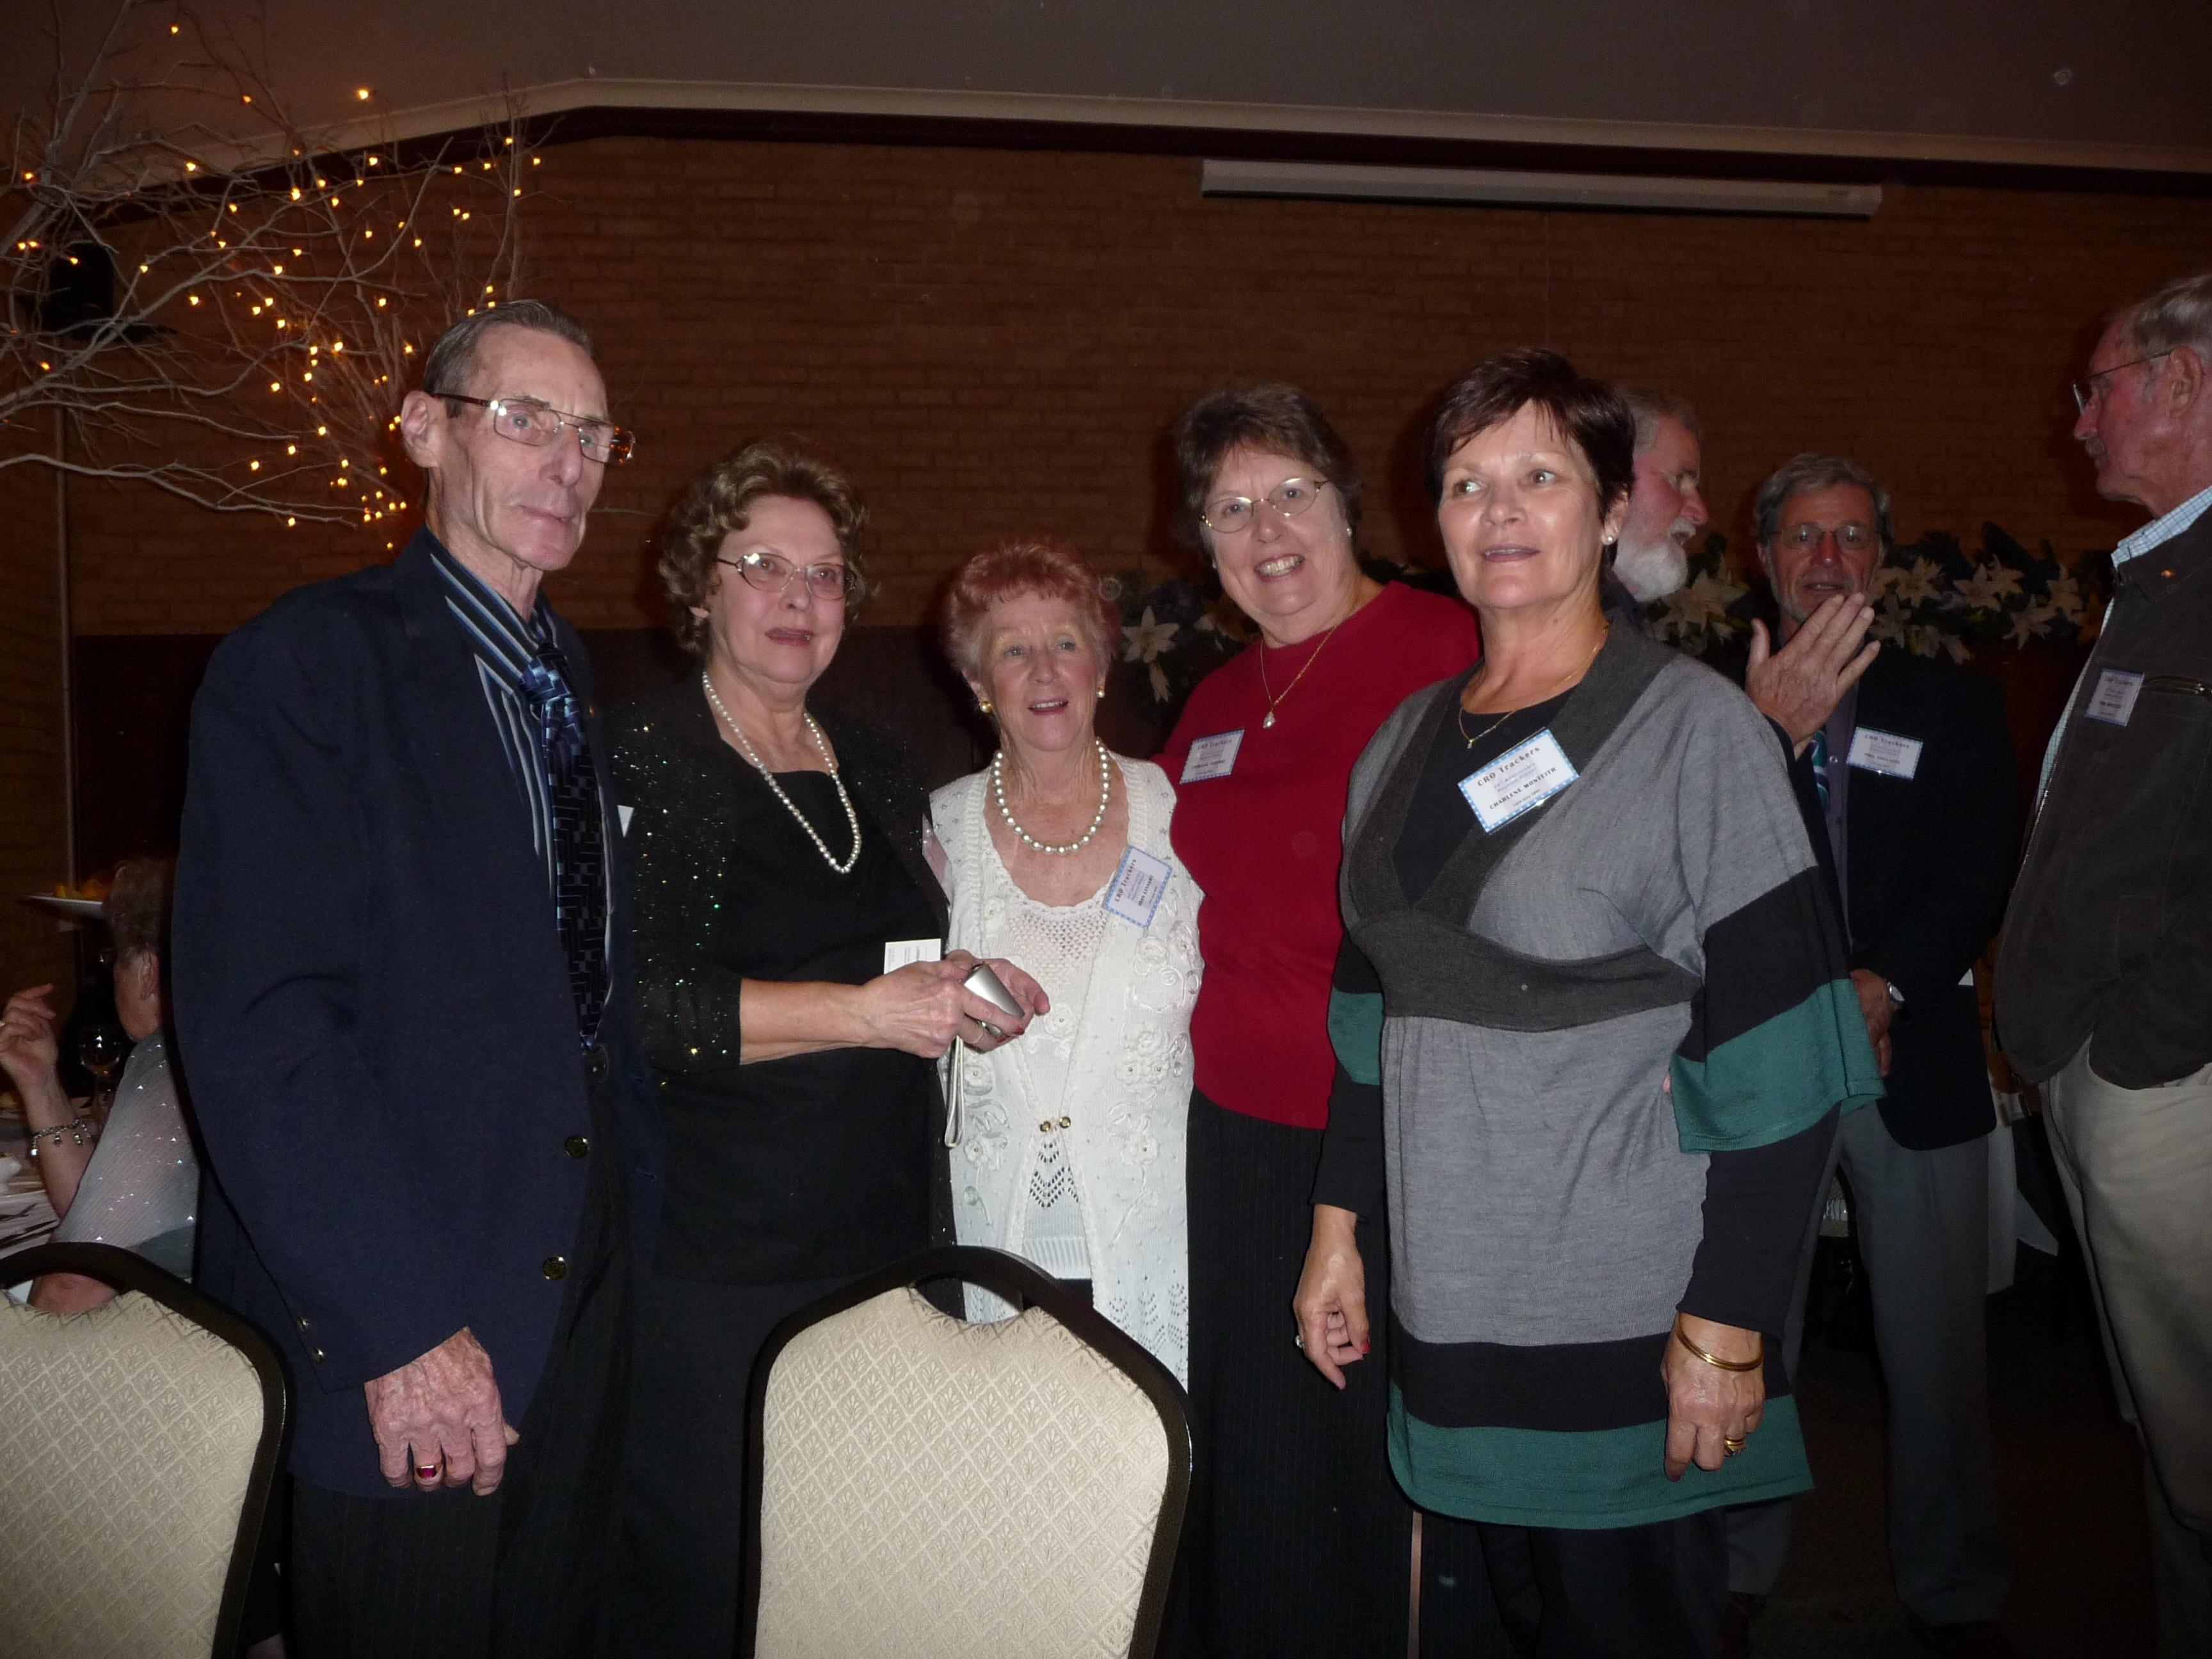 Tom Lysaght, Nadia Watson, Joan Lysaght, Lorraine Sartori (Rooney), Charlene Monteith